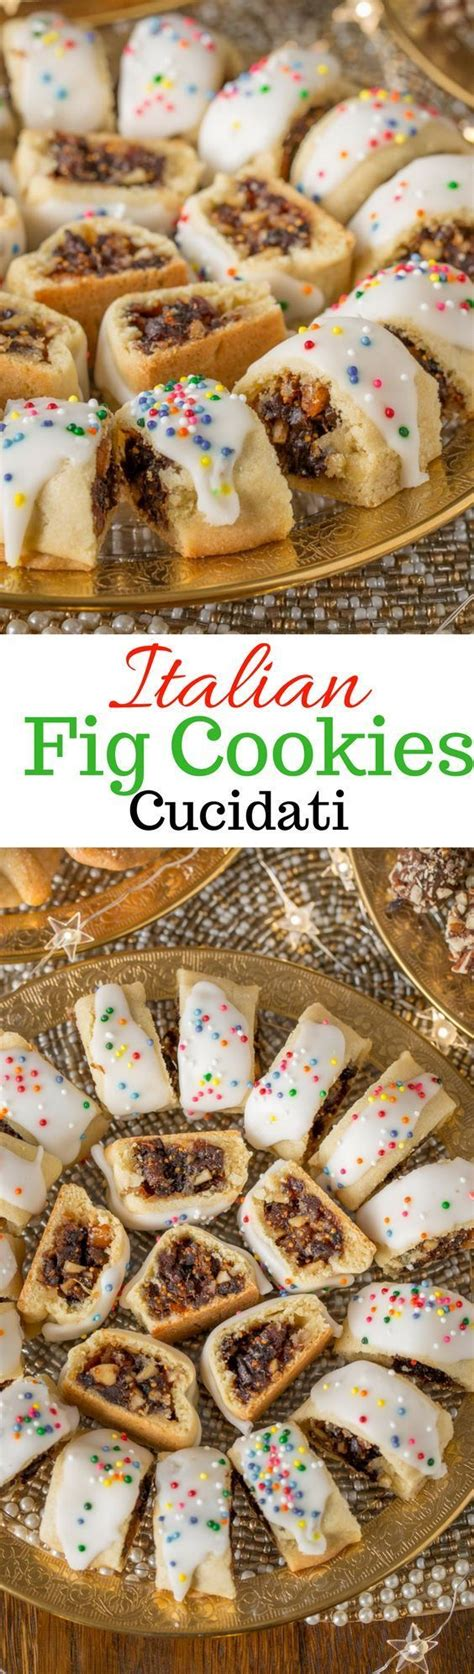 italian fig cookies cucidati recipe italian fig